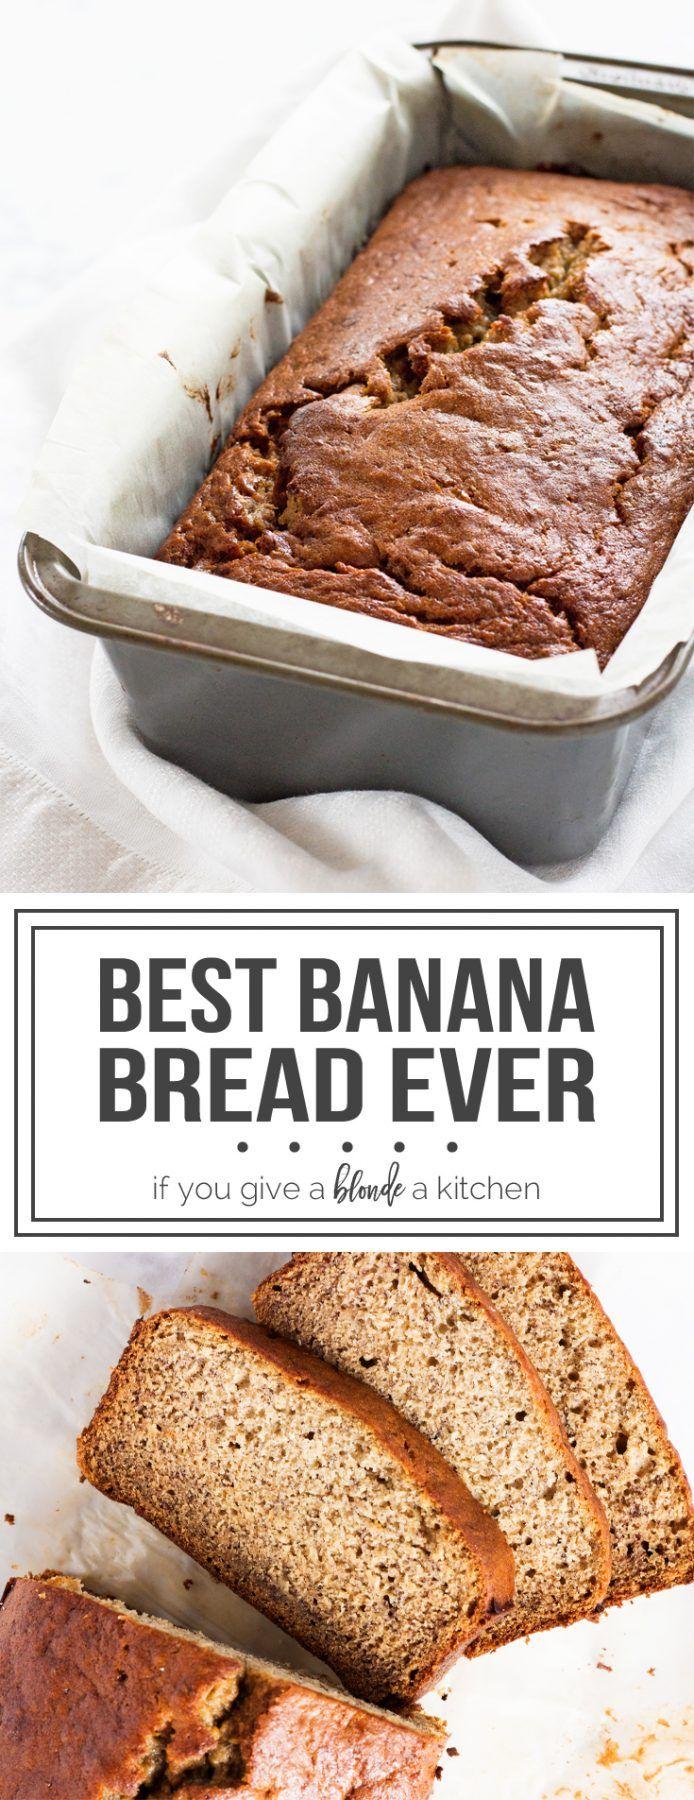 Recipe for best banana bread ever! Moist, tender and full of banana flavor. | www.ifyougiveablondeakitchen.com